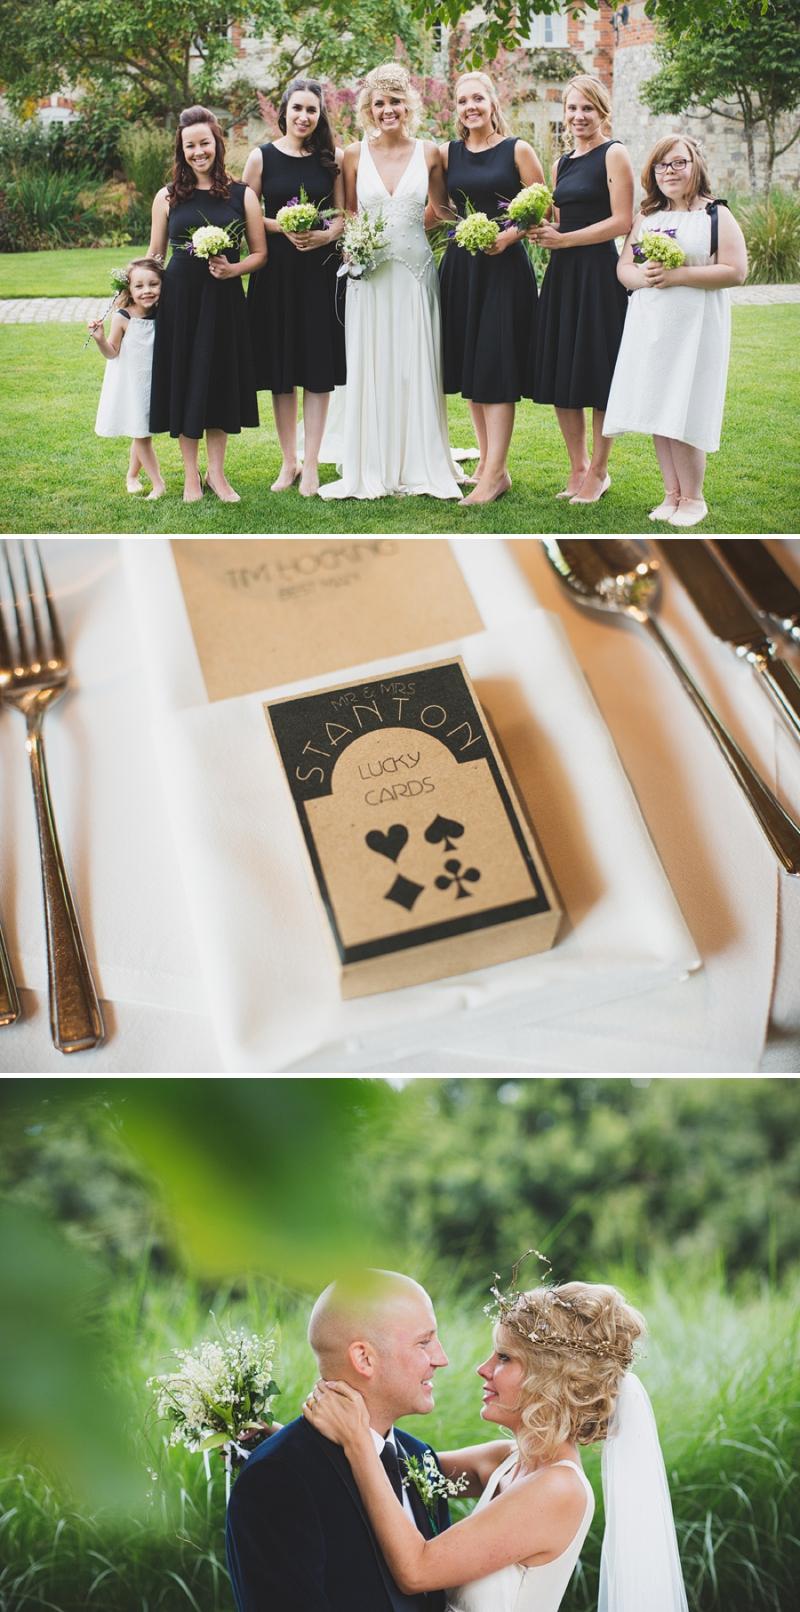 Pretty bespoke flower girl white dresses and black bridesmaid dresses from ASOS